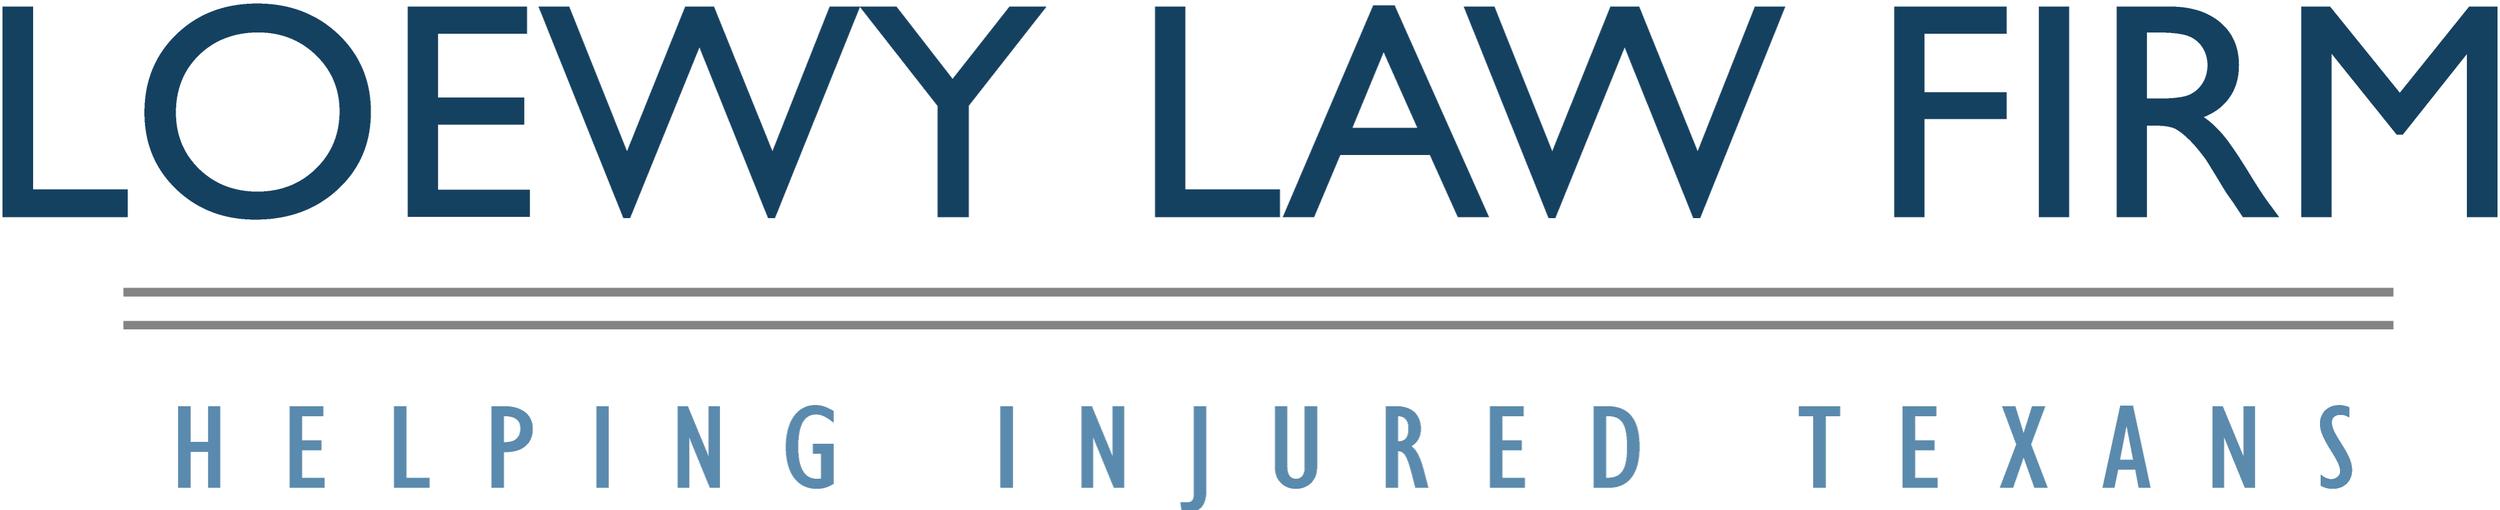 LoweyLawfirm_Logo_20170816.png